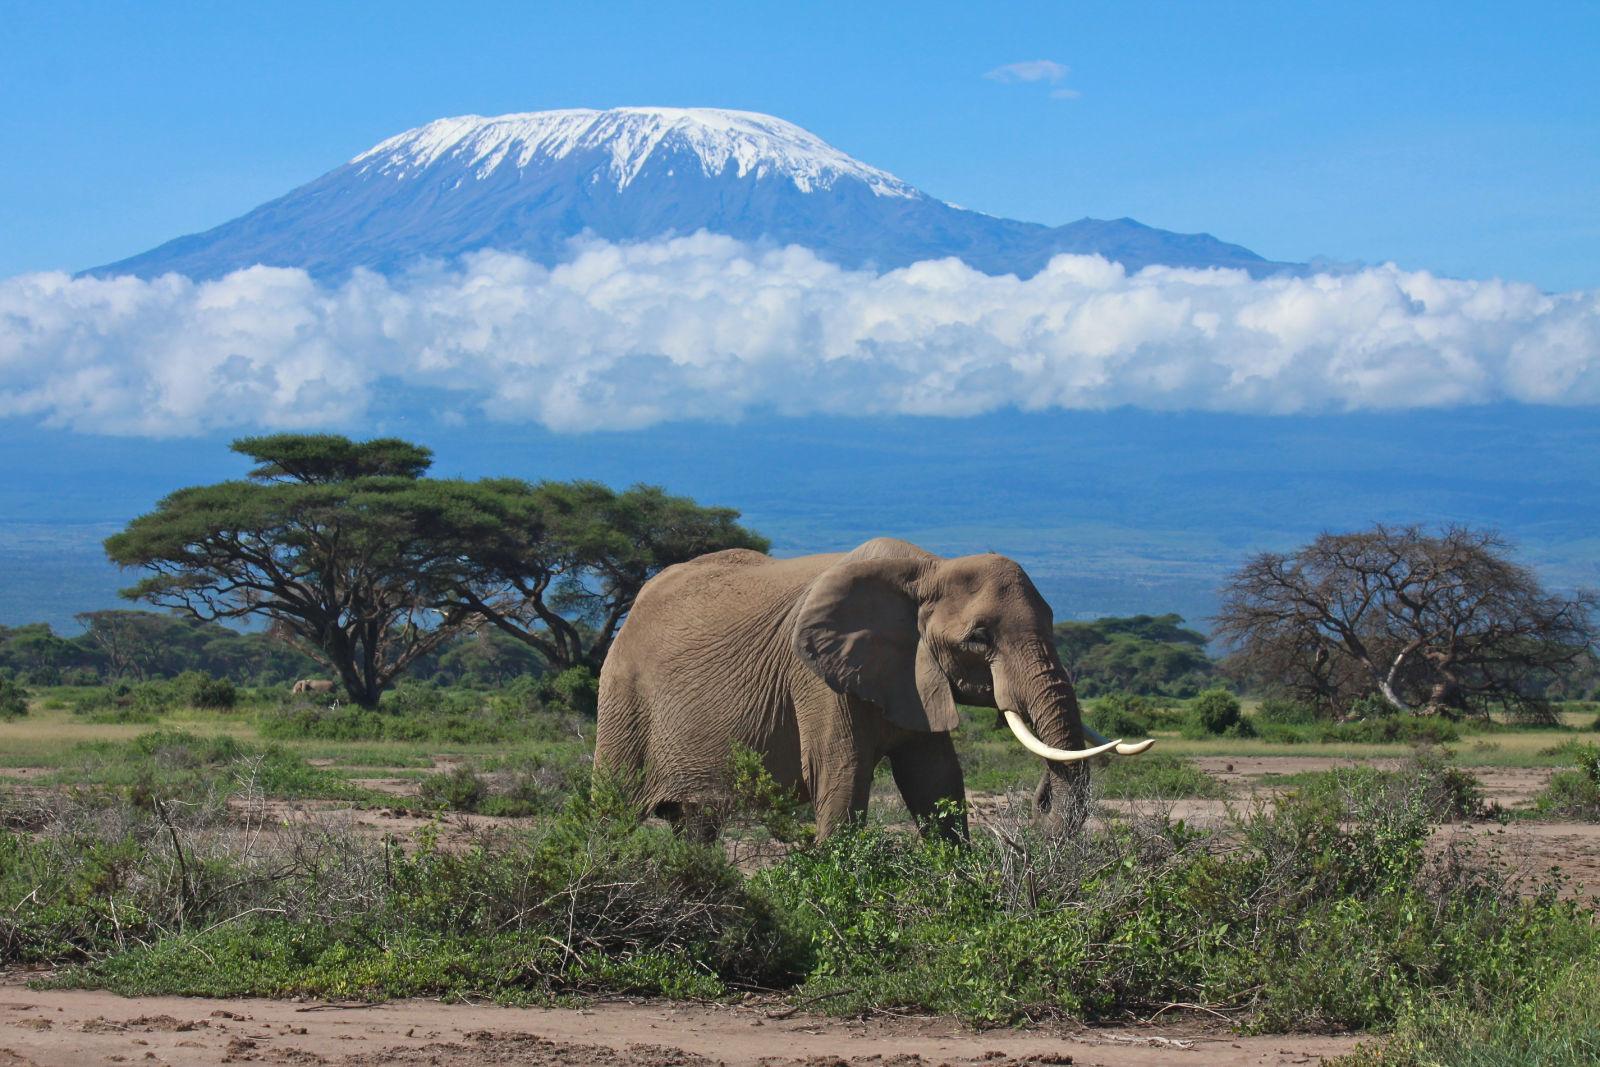 Africa, Animal, Cloud